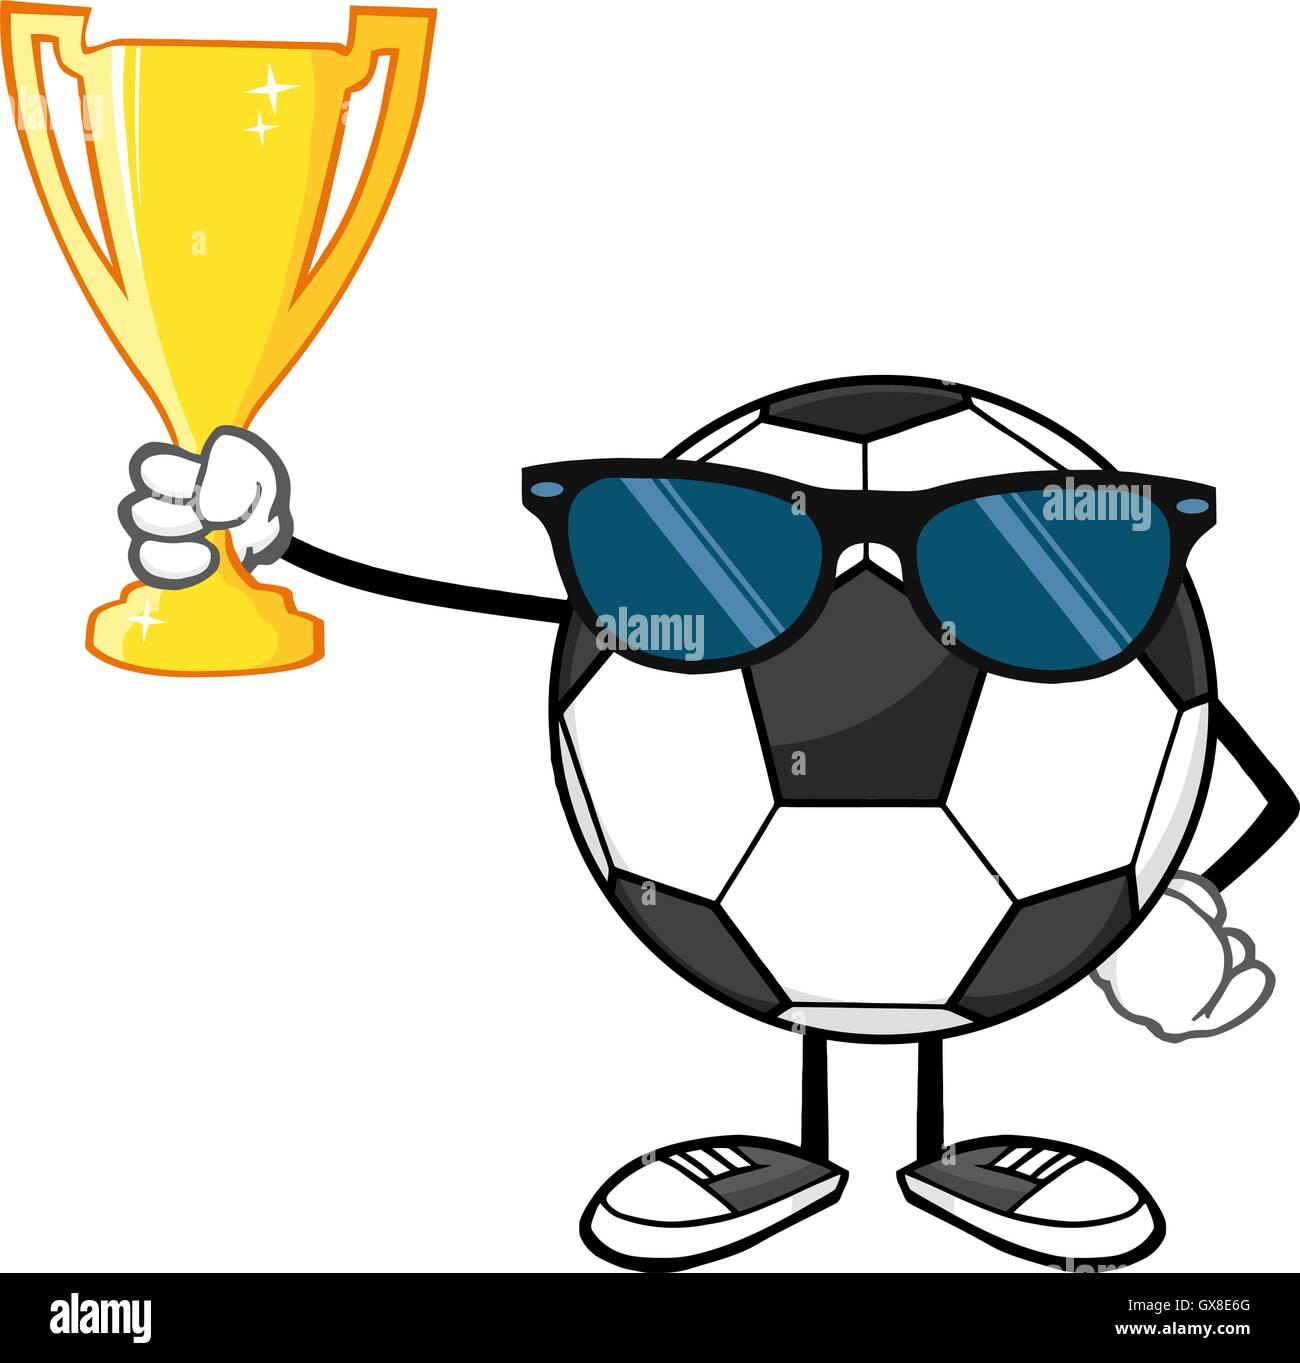 Ballon de foot gagnant dessin anim sans visage avec des - Dessin ballon foot ...